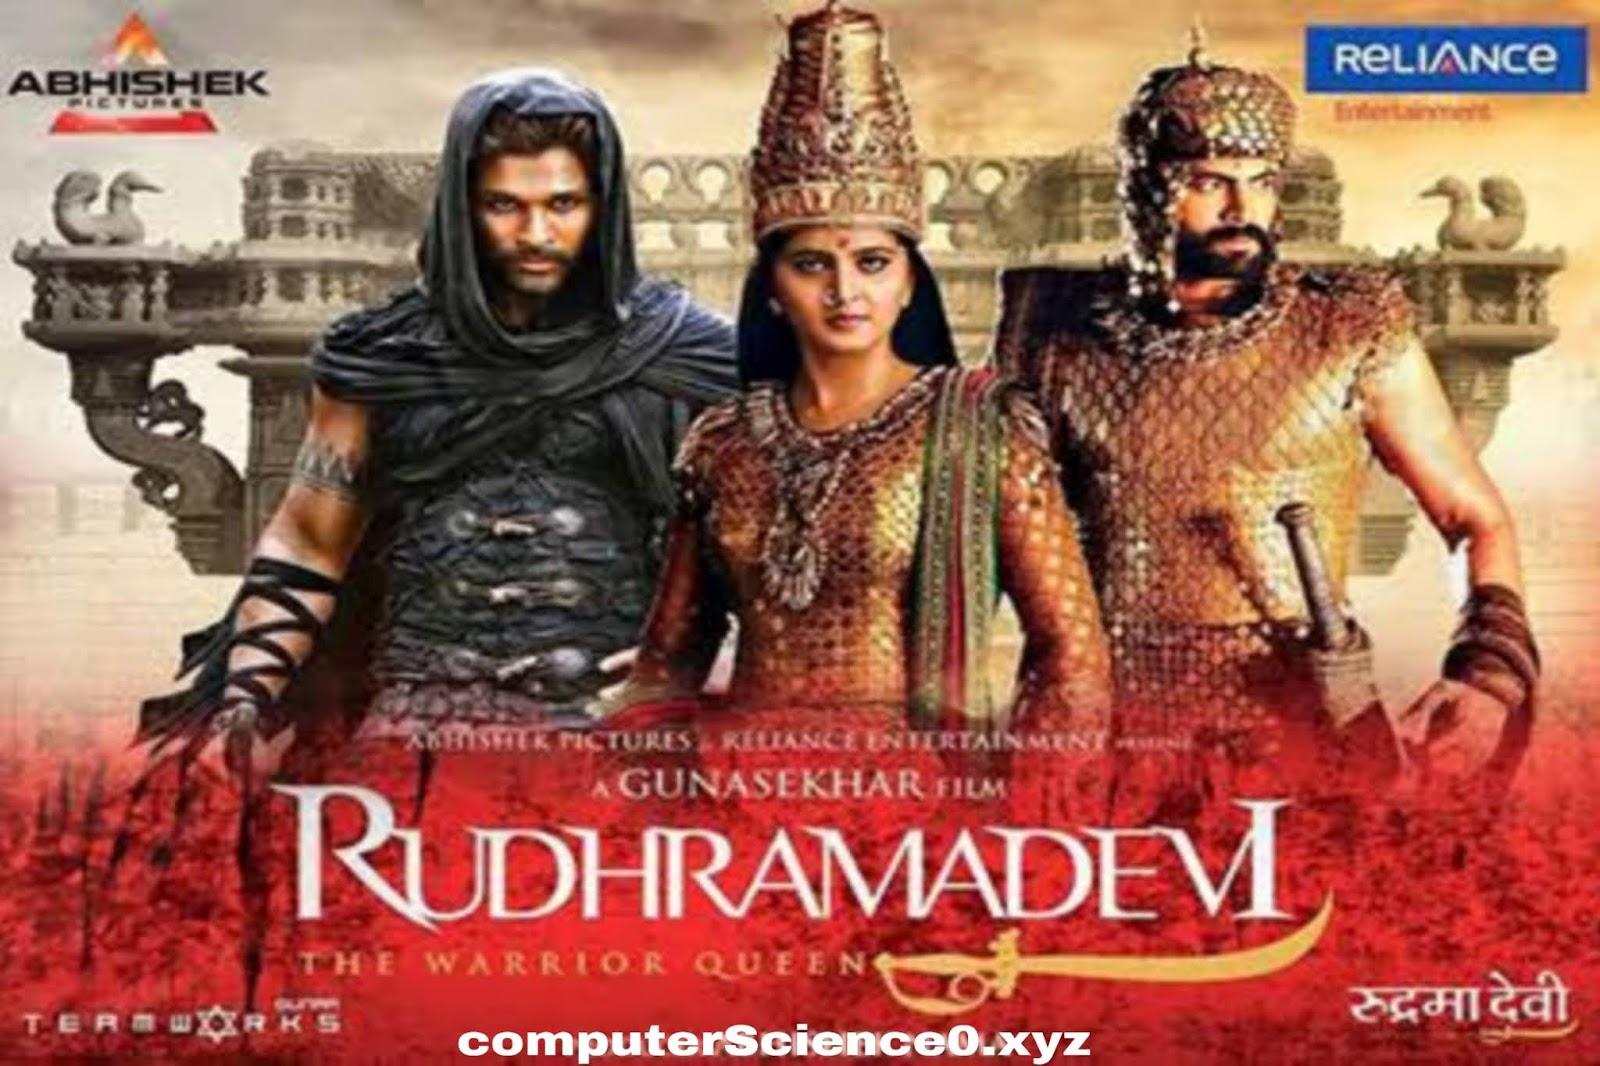 Rudhramadevi Allu Arjun's Top 19 movies of all time